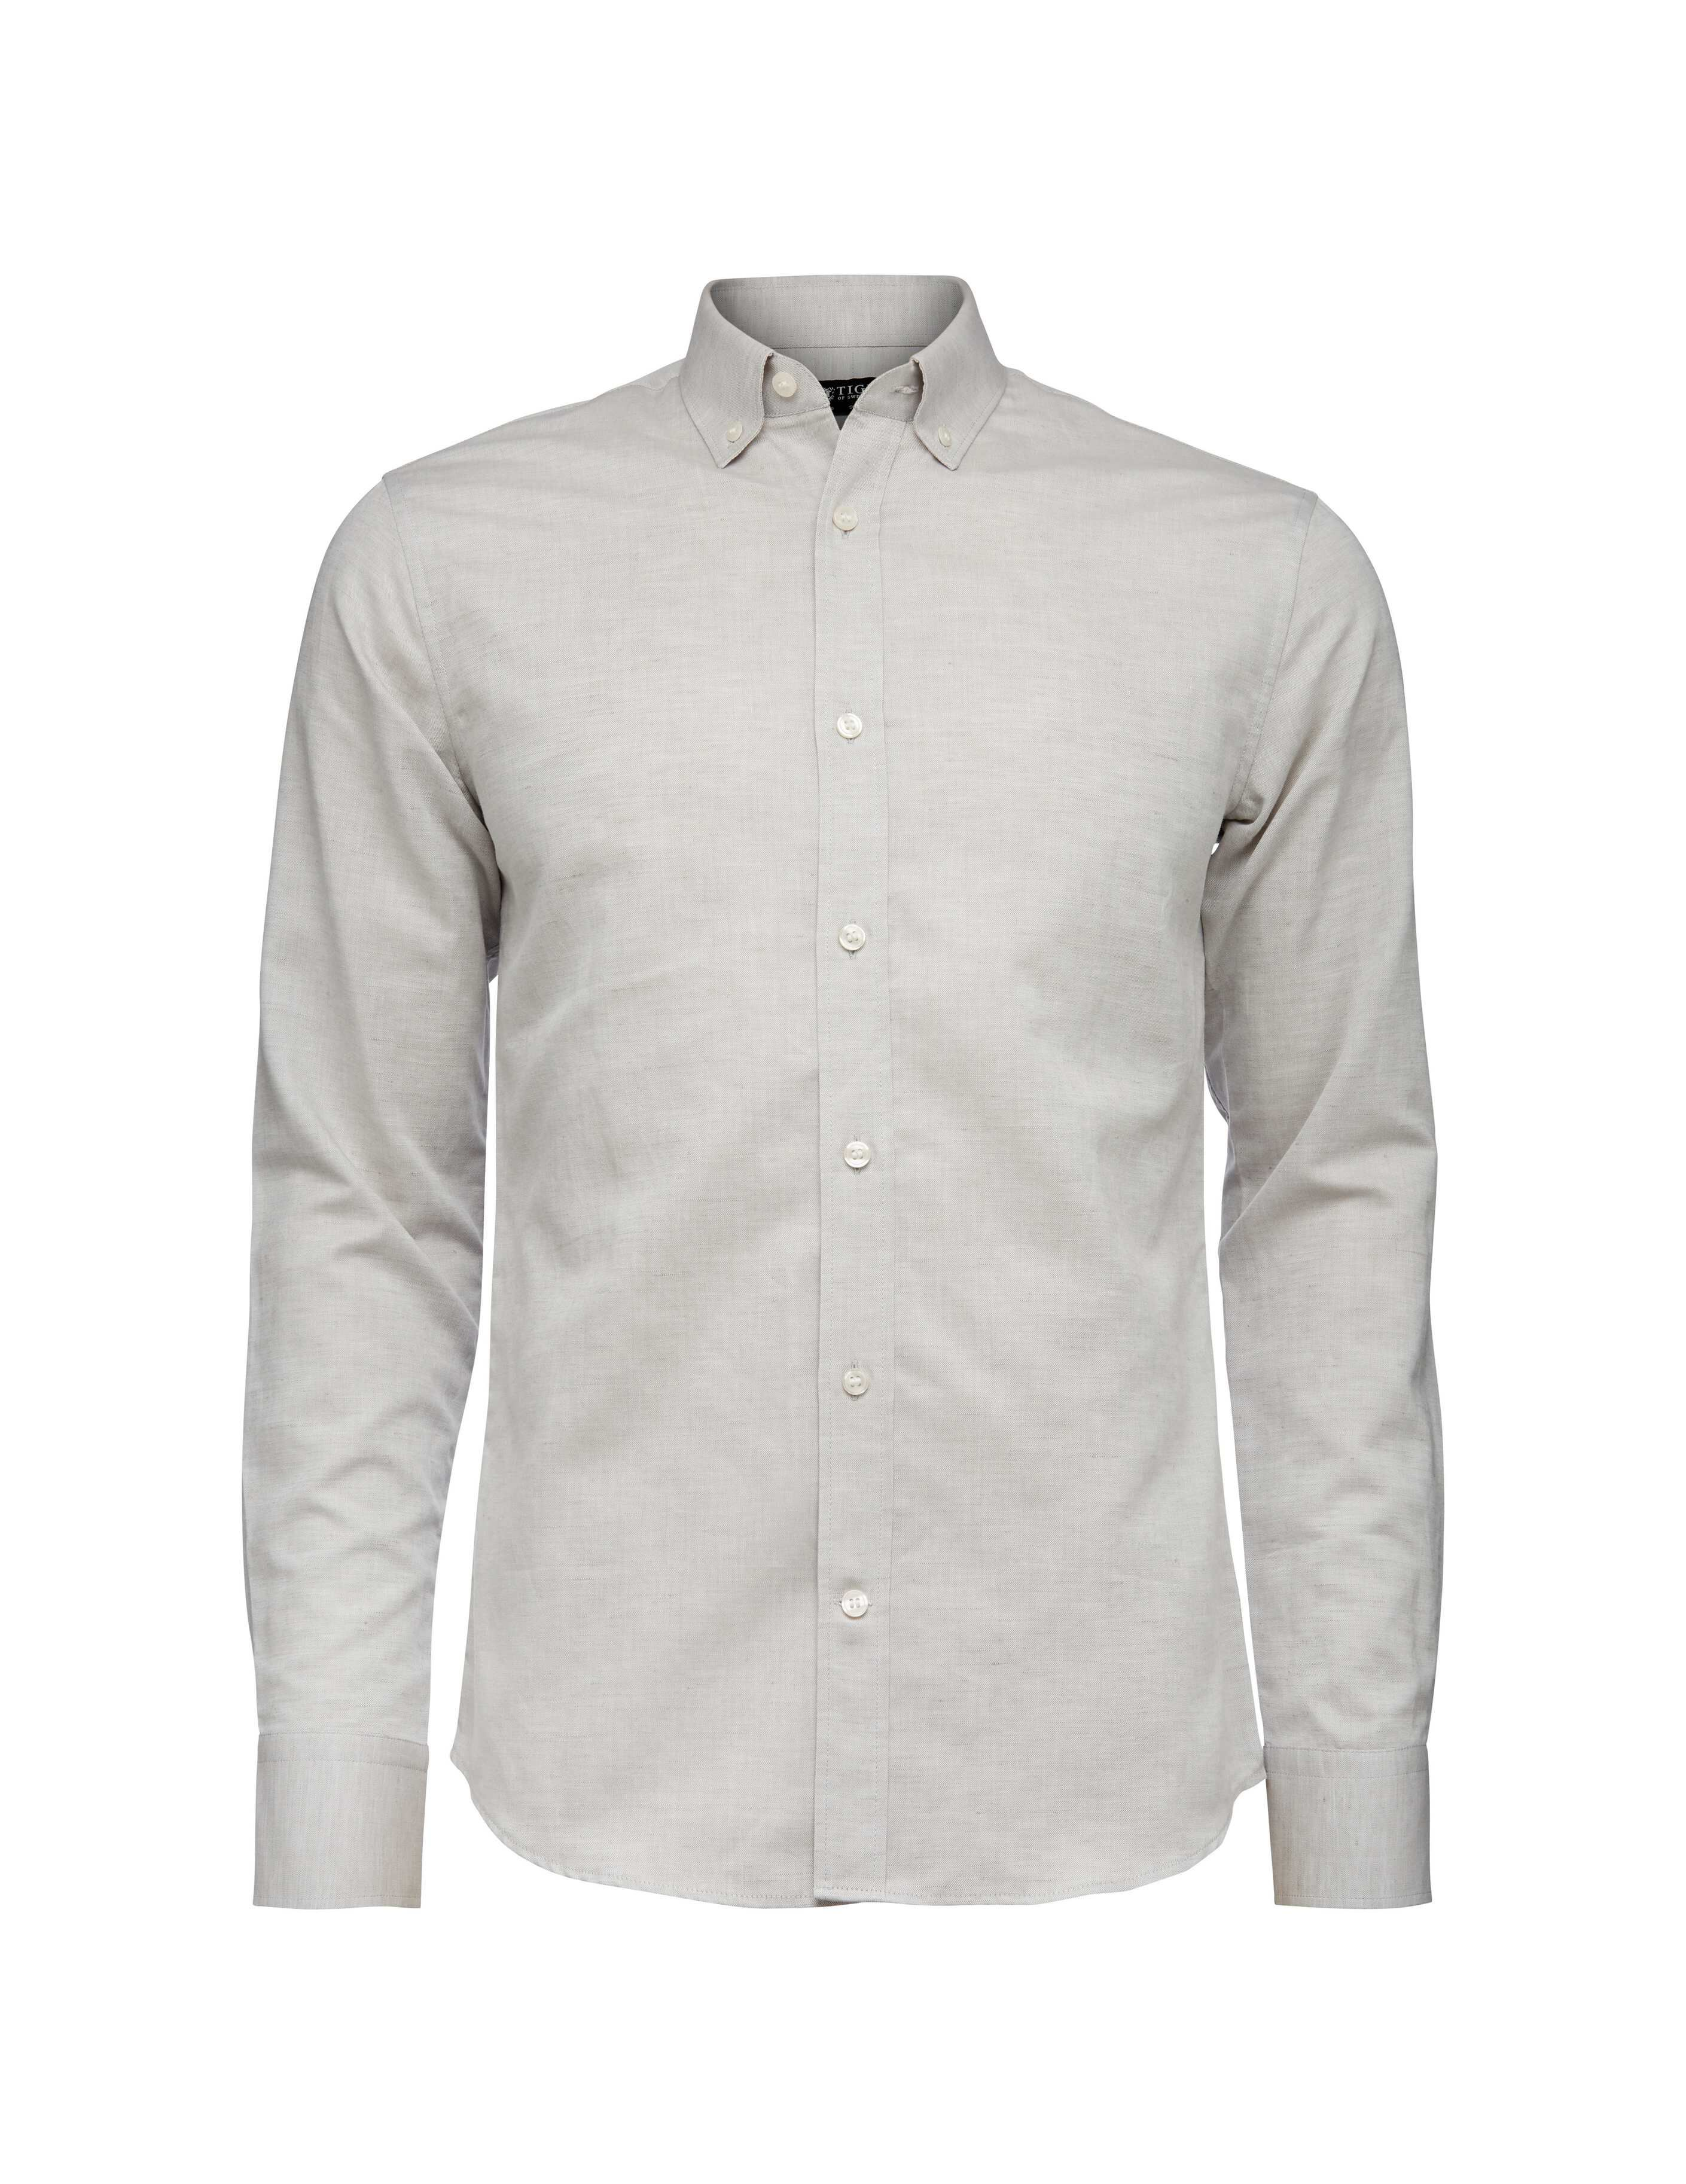 Donald shirt. Slim-fit shirt in cotton-linen oxford